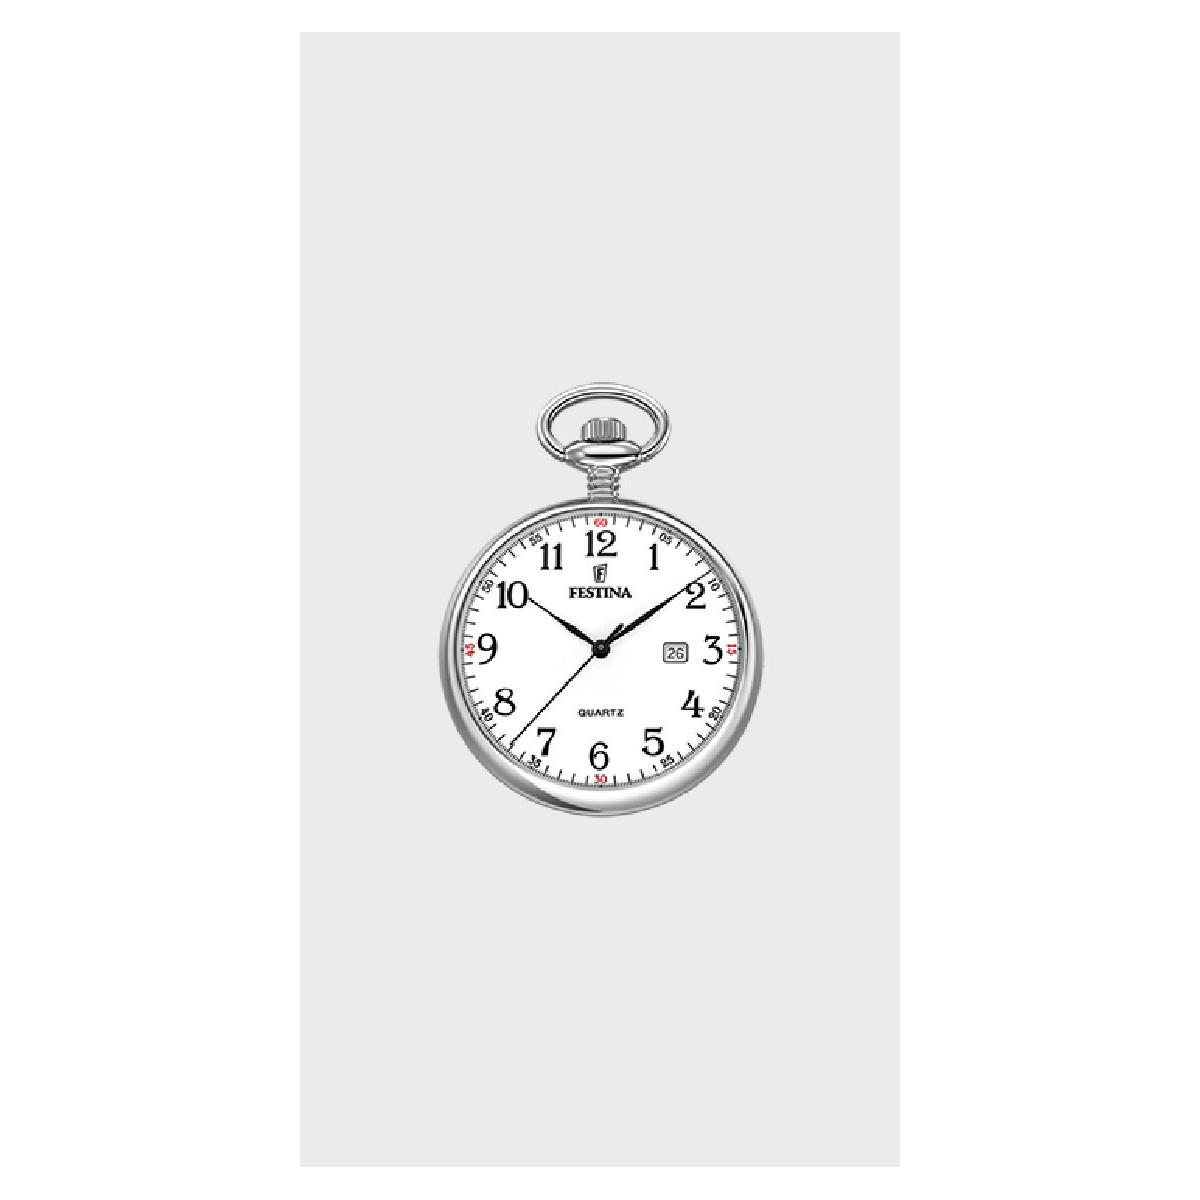 Reloj Festina - F2019-1